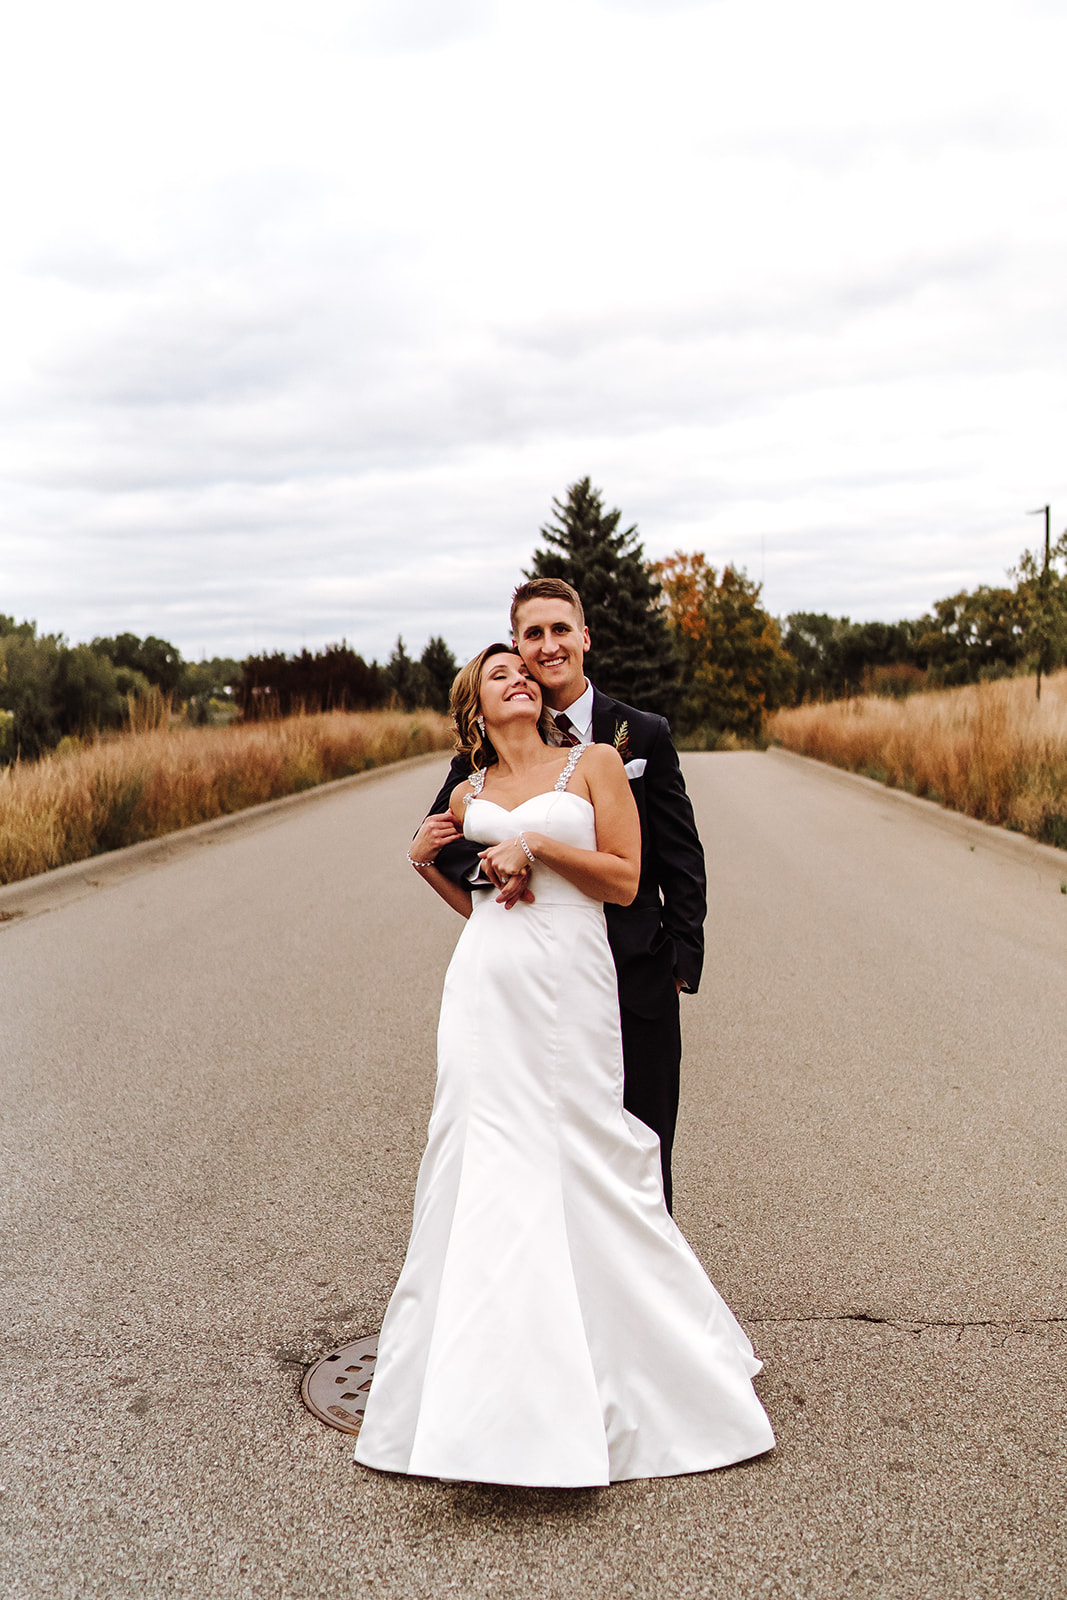 Scott and Andrea Wedding 2018-864.jpg